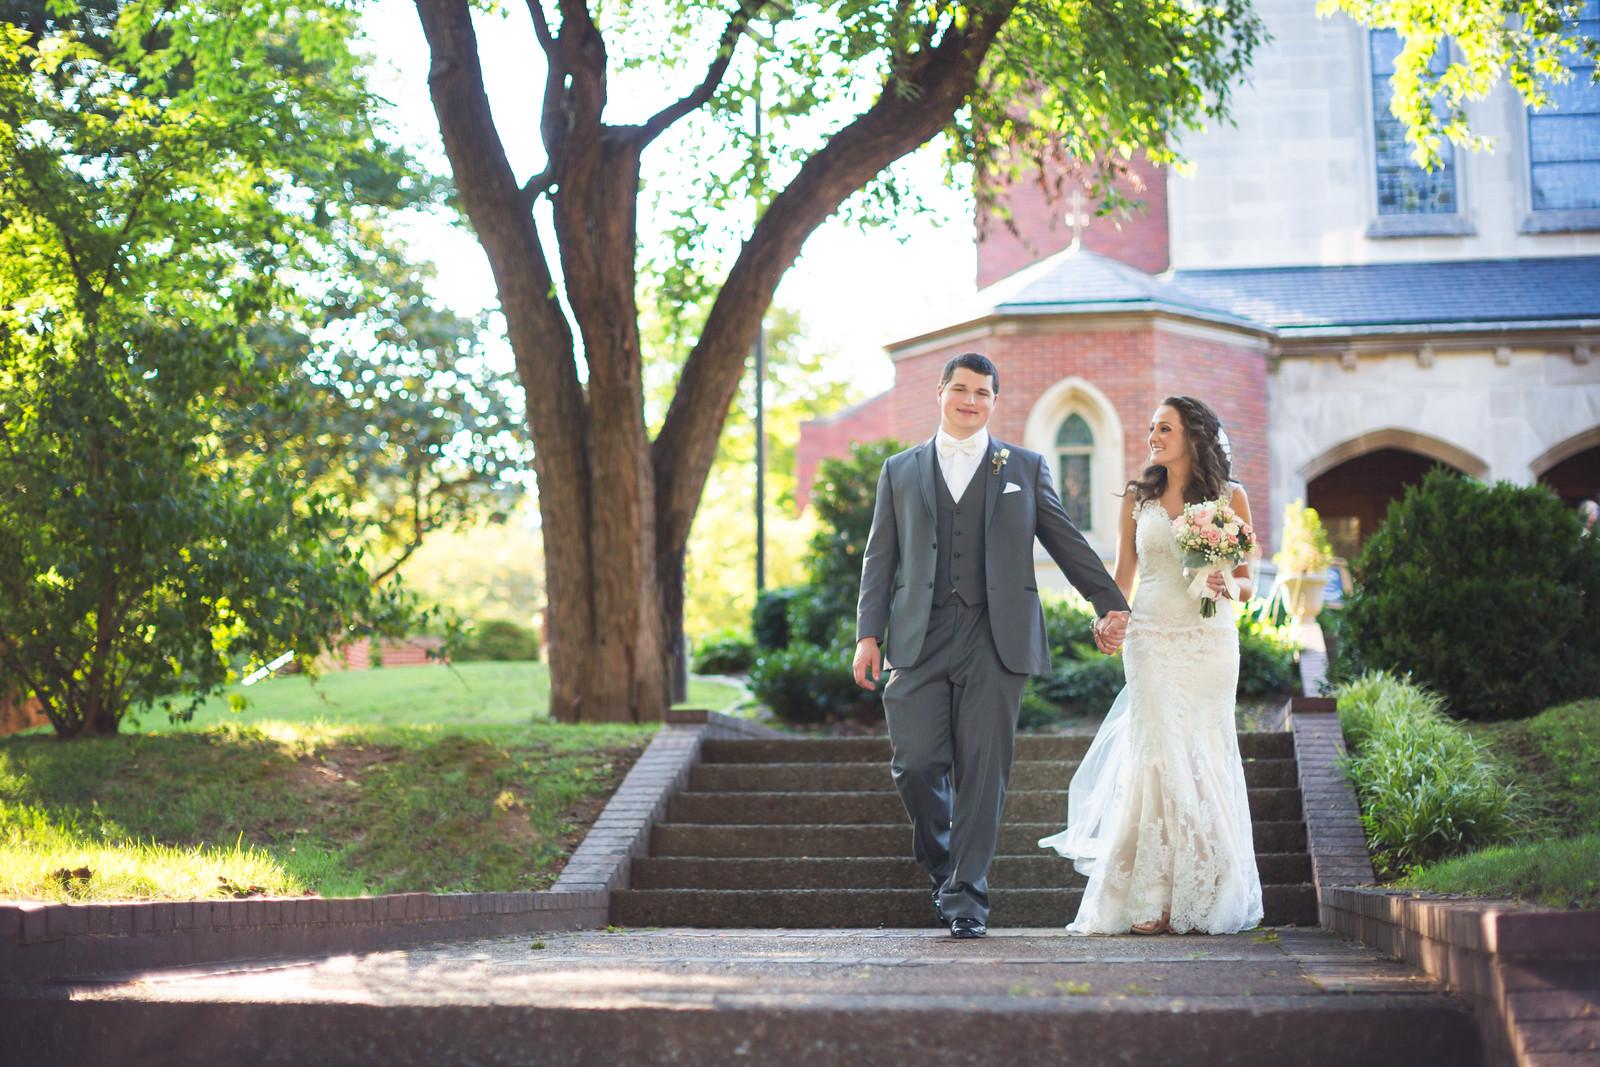 455_Harrison+Merritt_Wedding-X3.jpg